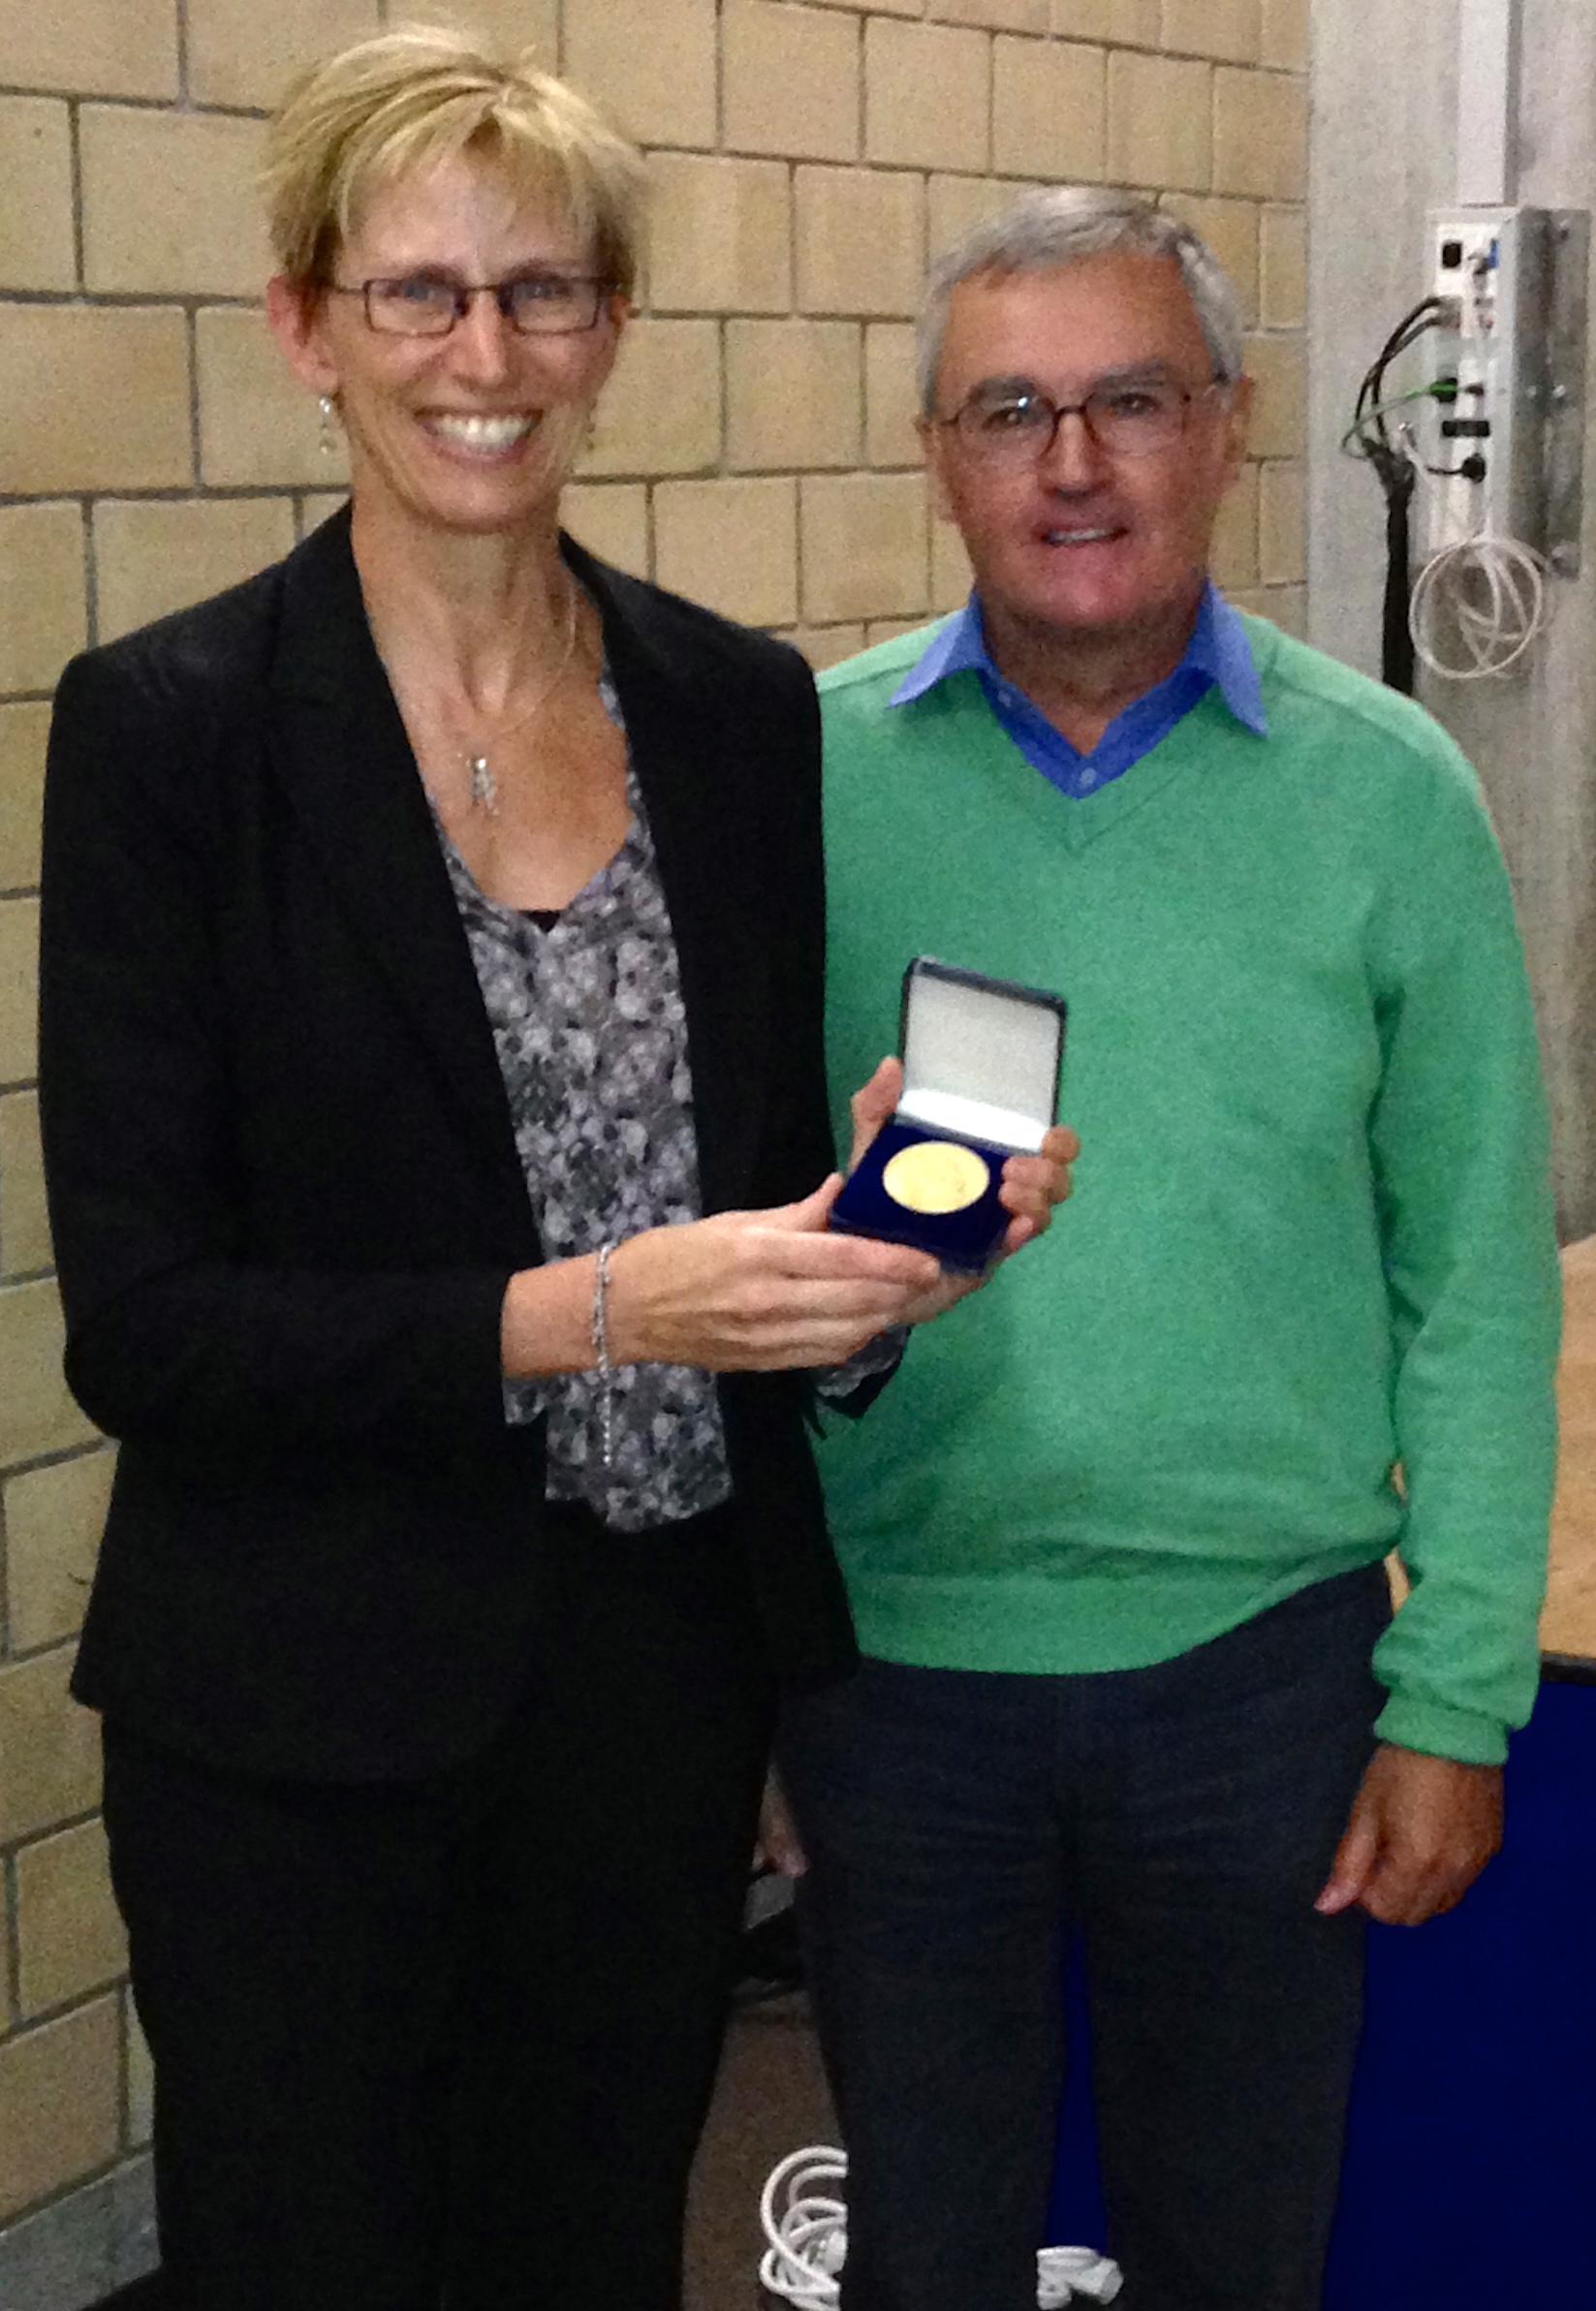 Prof. Laura Kiessling receiving the Hofmann medal from Prof. John Robinson